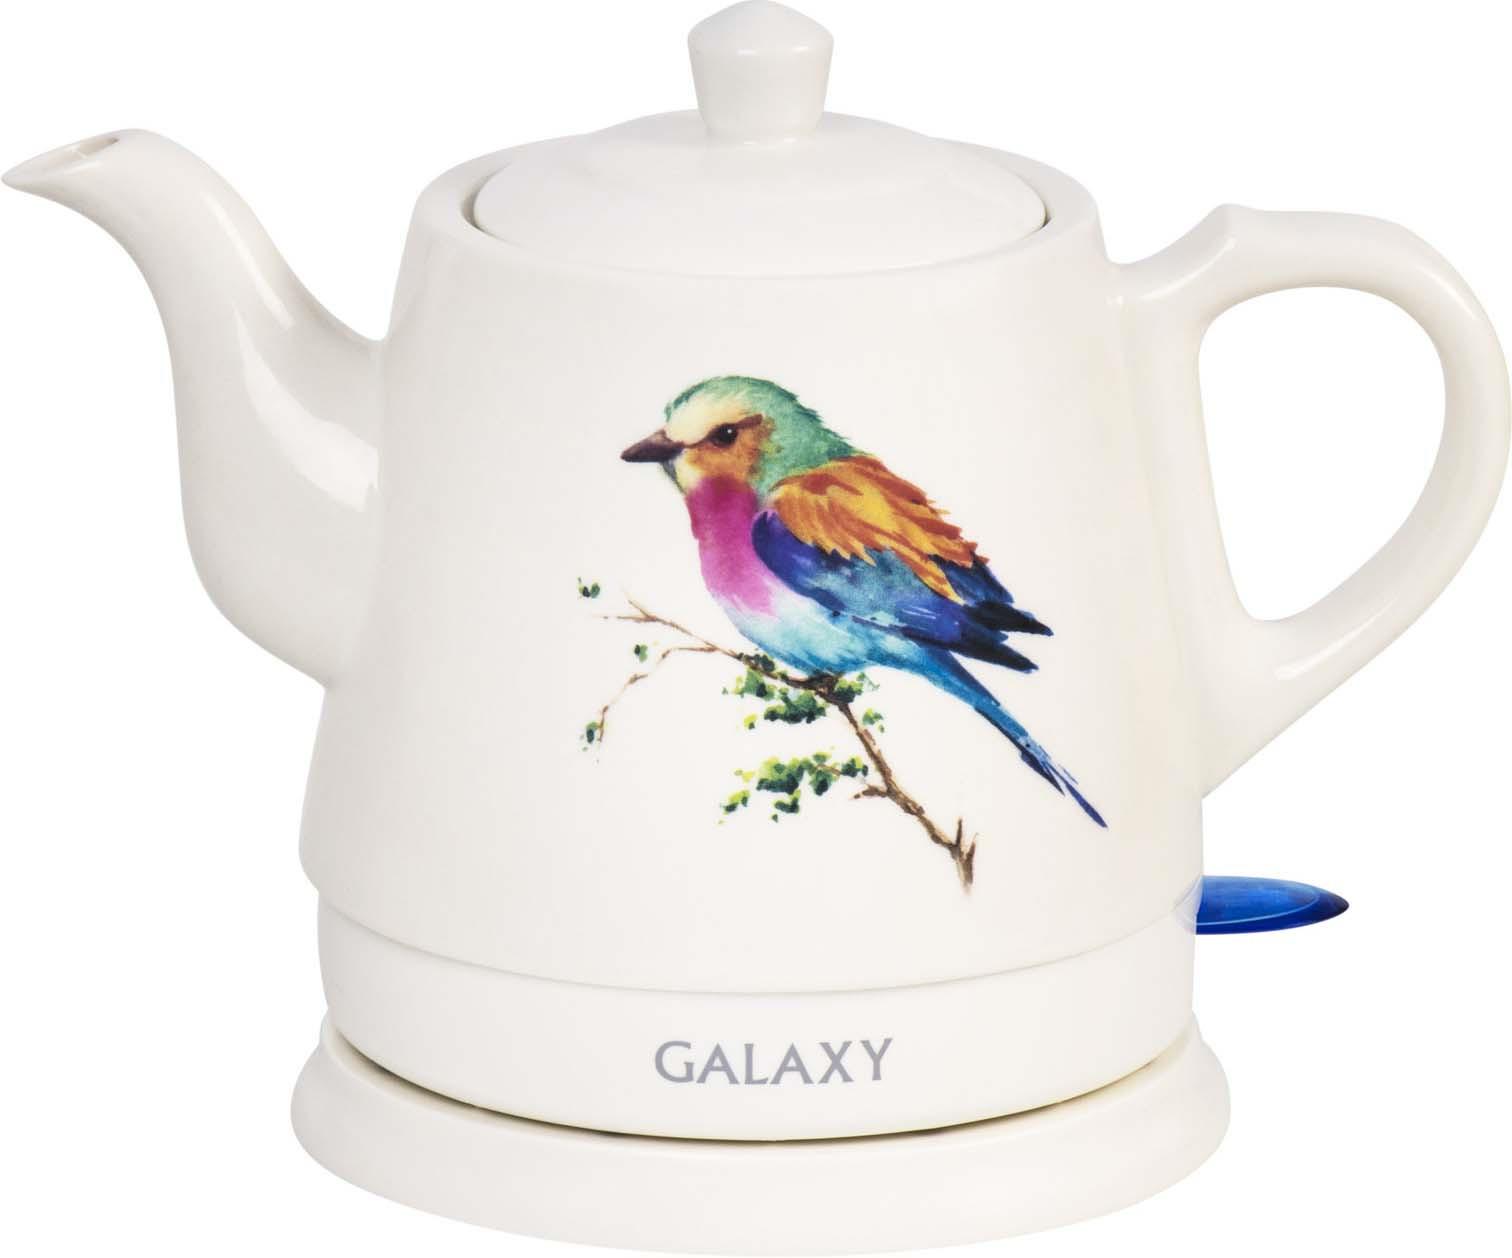 Электрический чайник Galaxy GL 0501, цвет: белый, 1 л